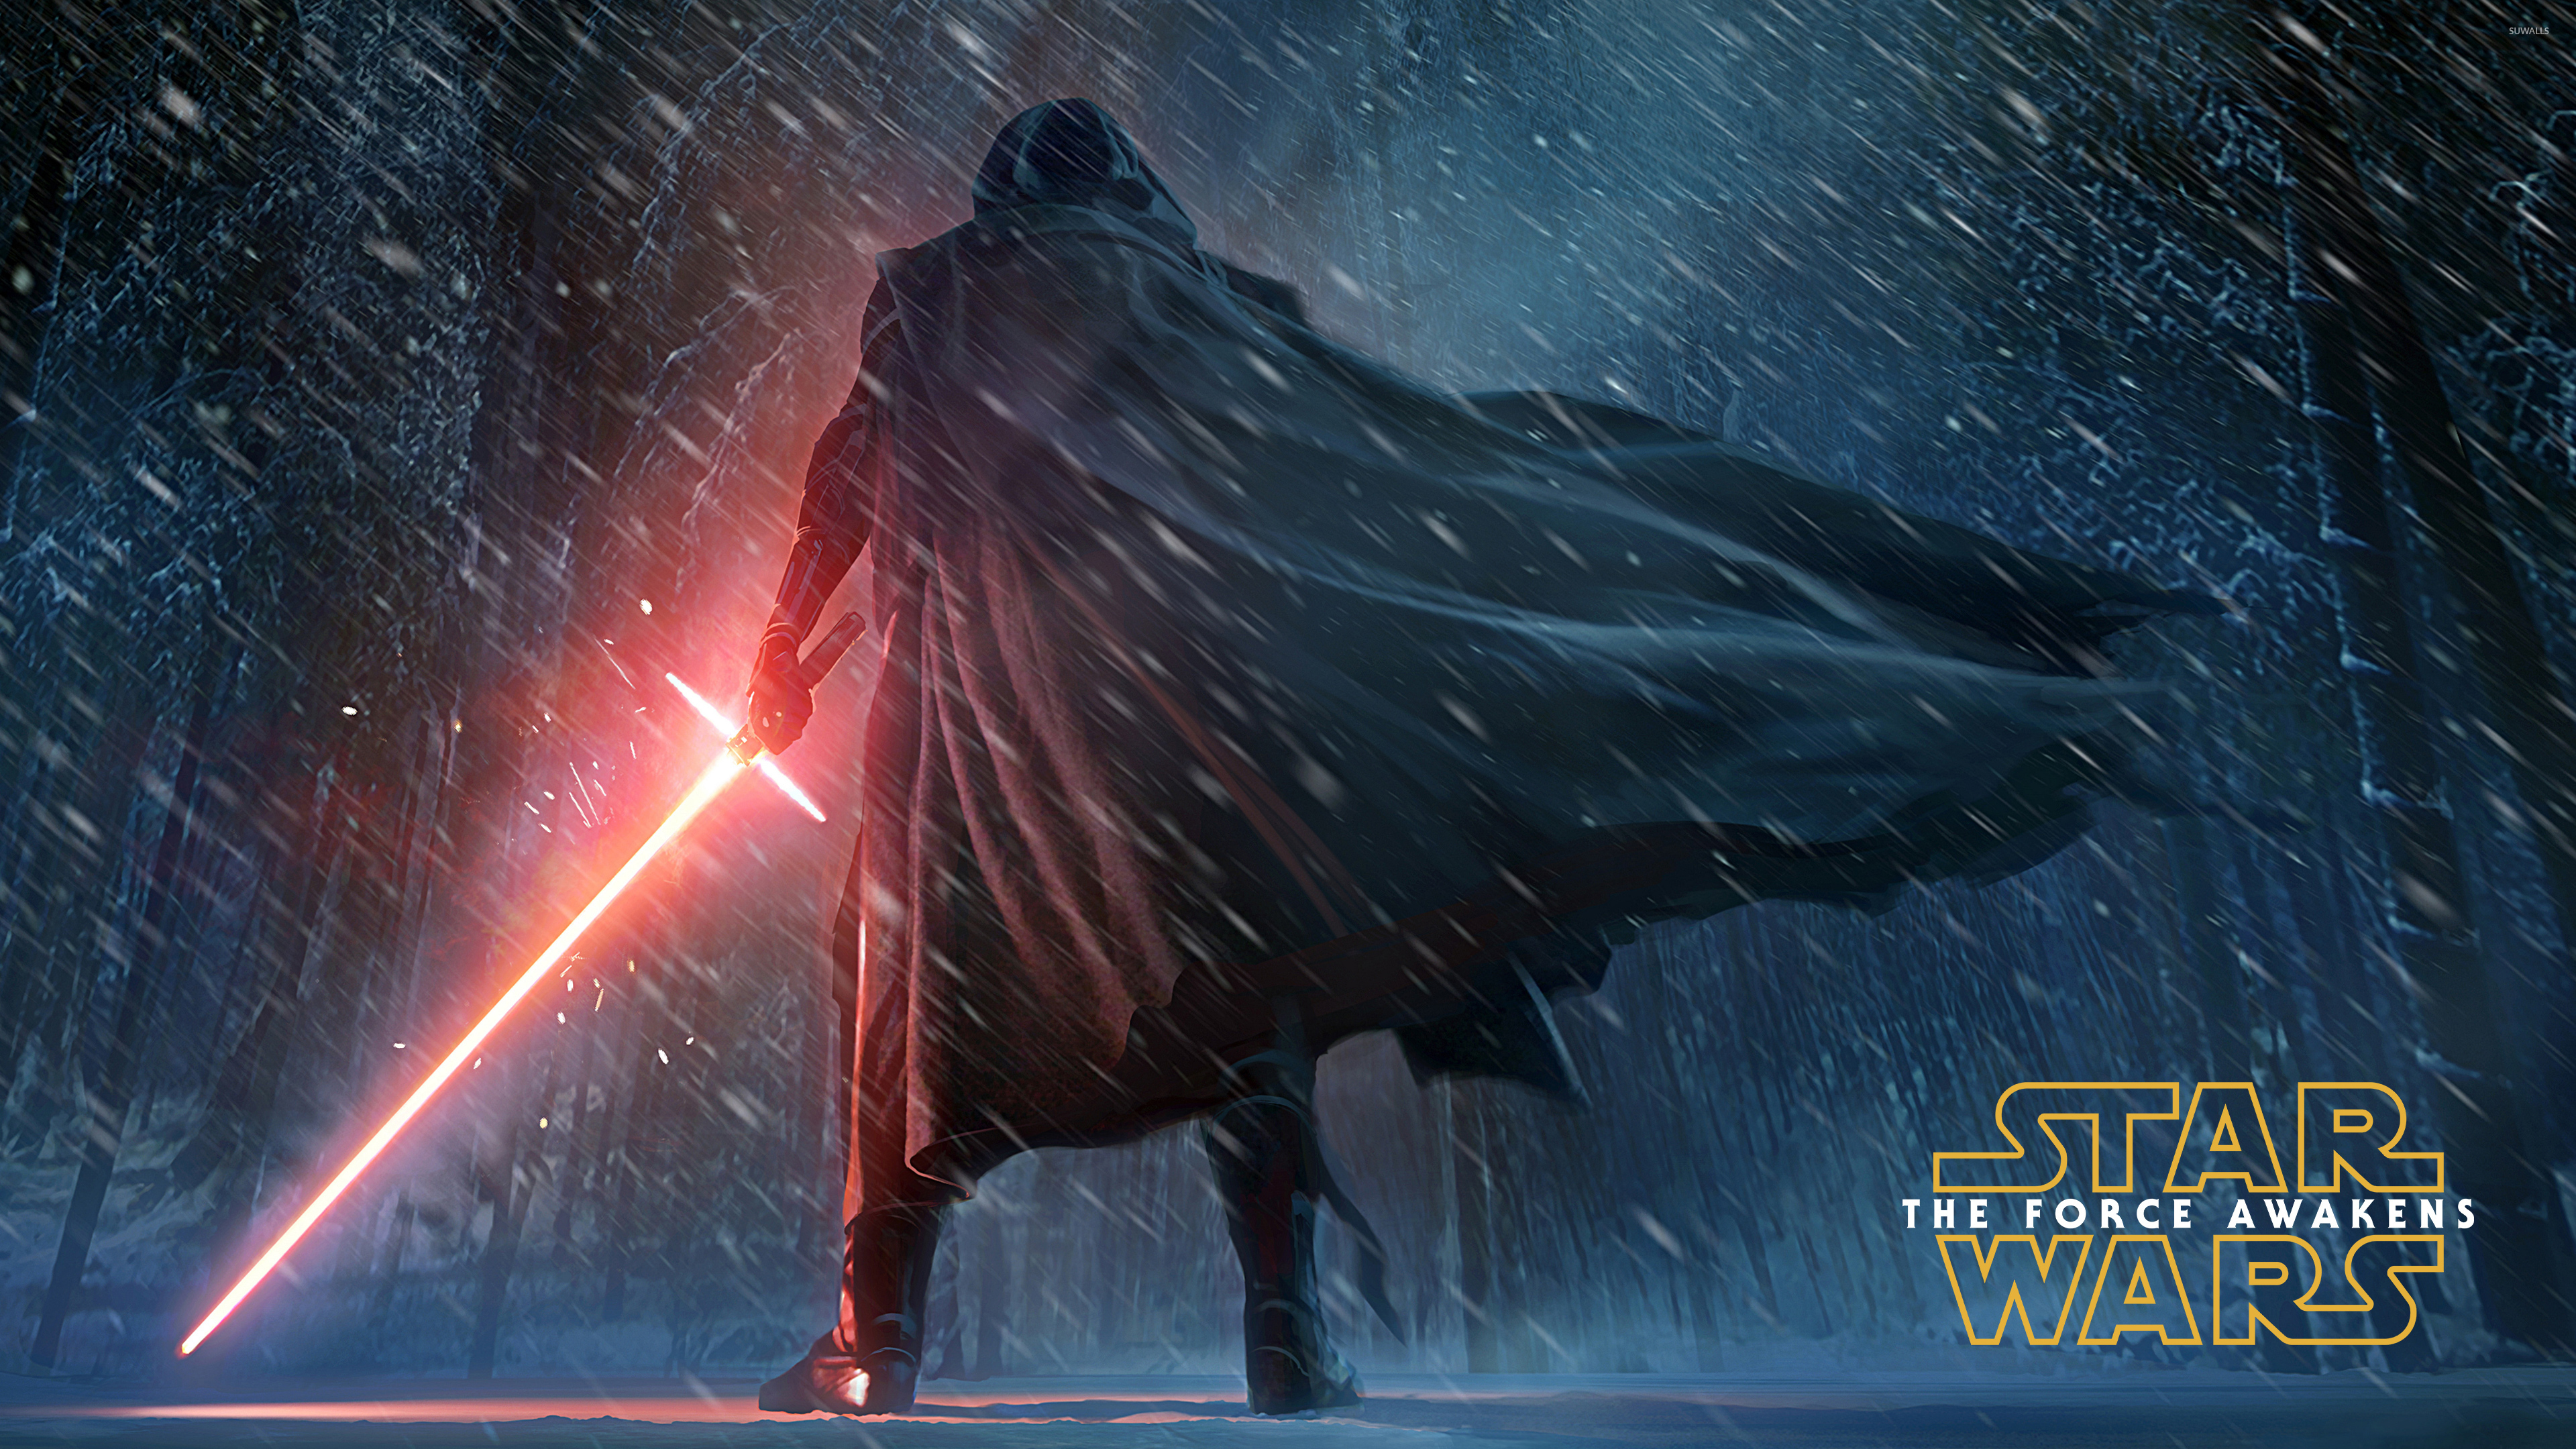 Star Wars Full Hd 2927292 Hd Wallpaper Backgrounds Download